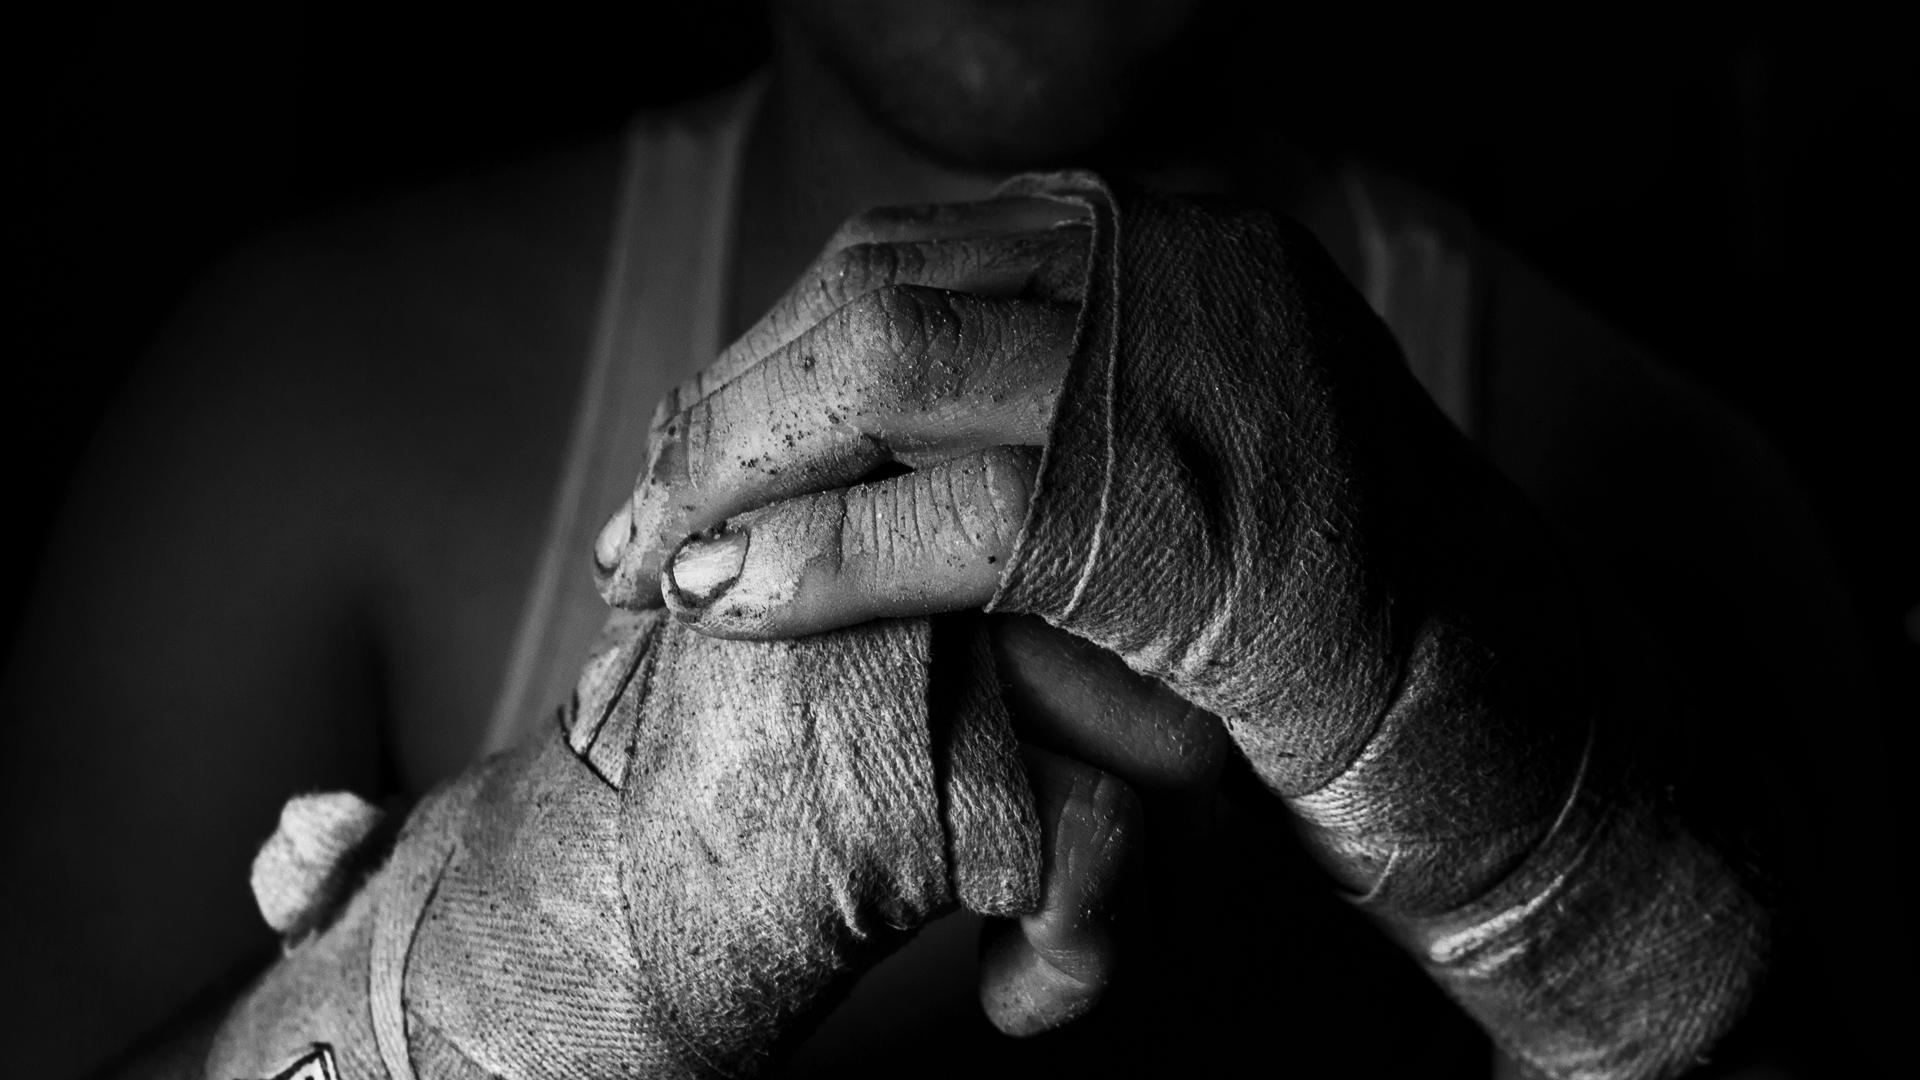 hands_man_struggle_fists_bandage